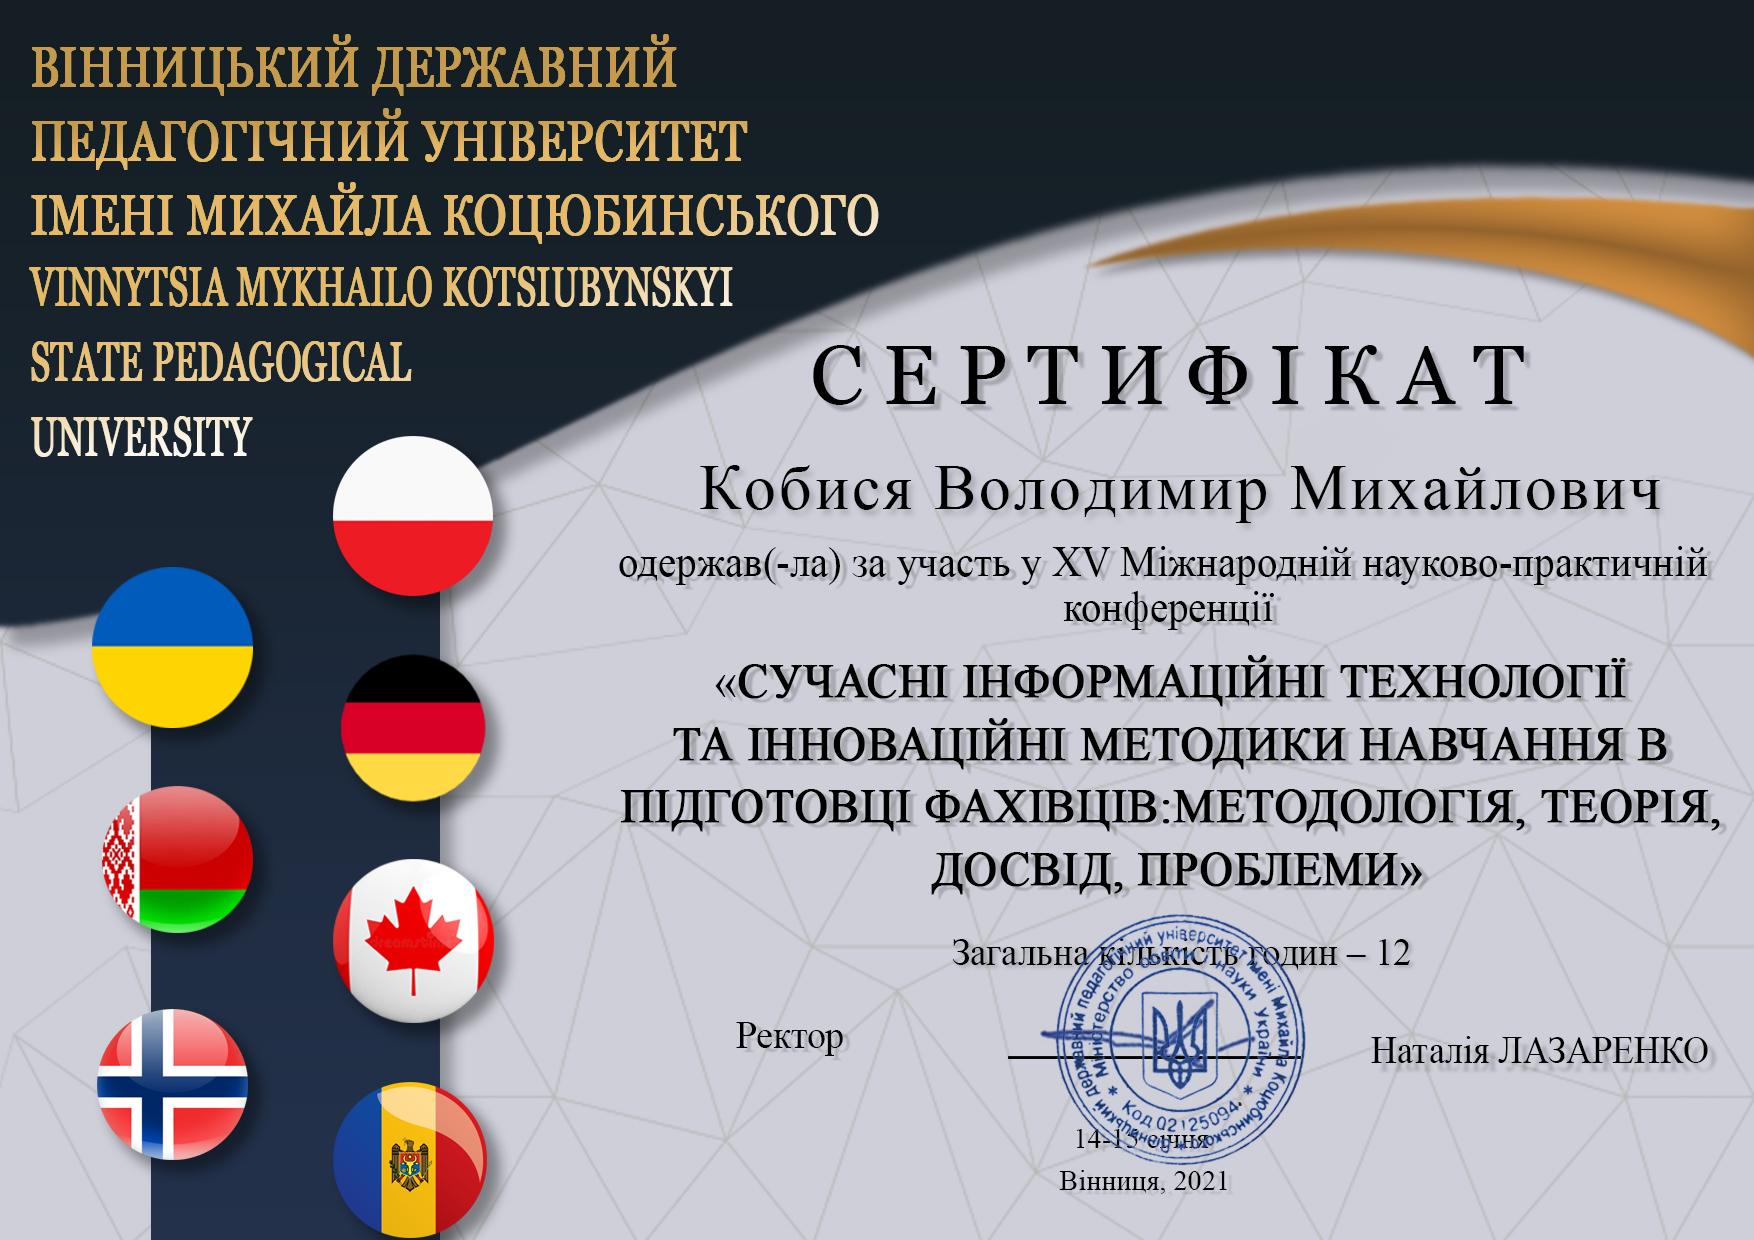 Кобися Володимир Михайлович